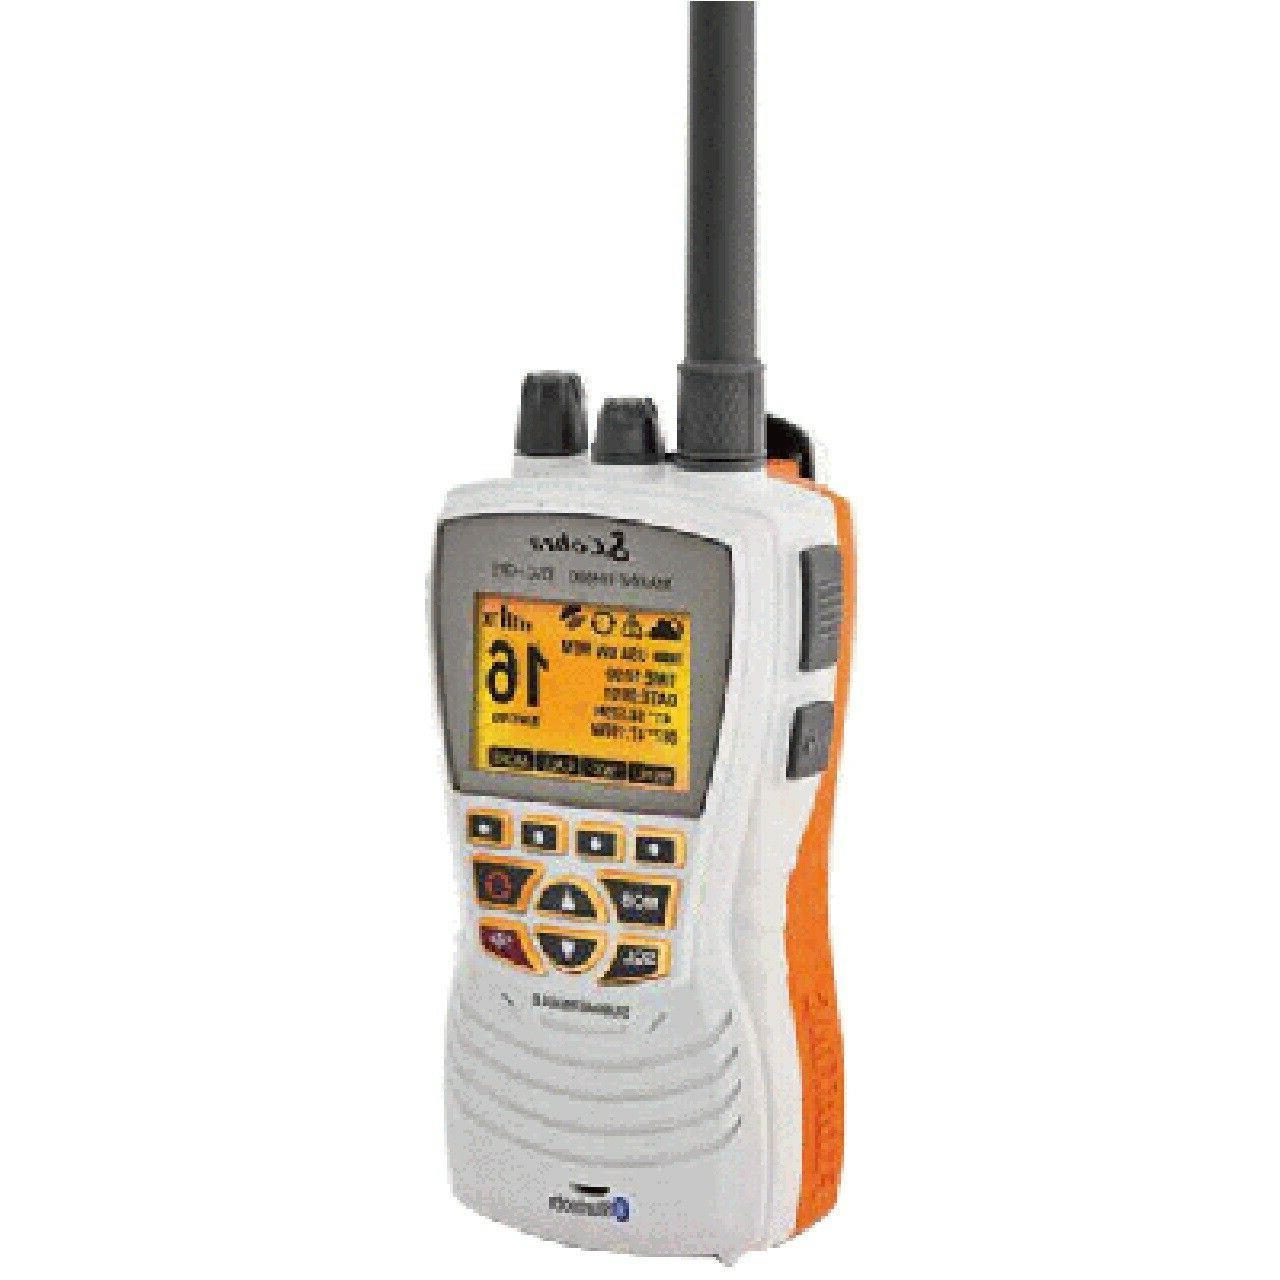 Cobra MR HH600W Floating GPS VHF Radio w-Bluetooth - White *